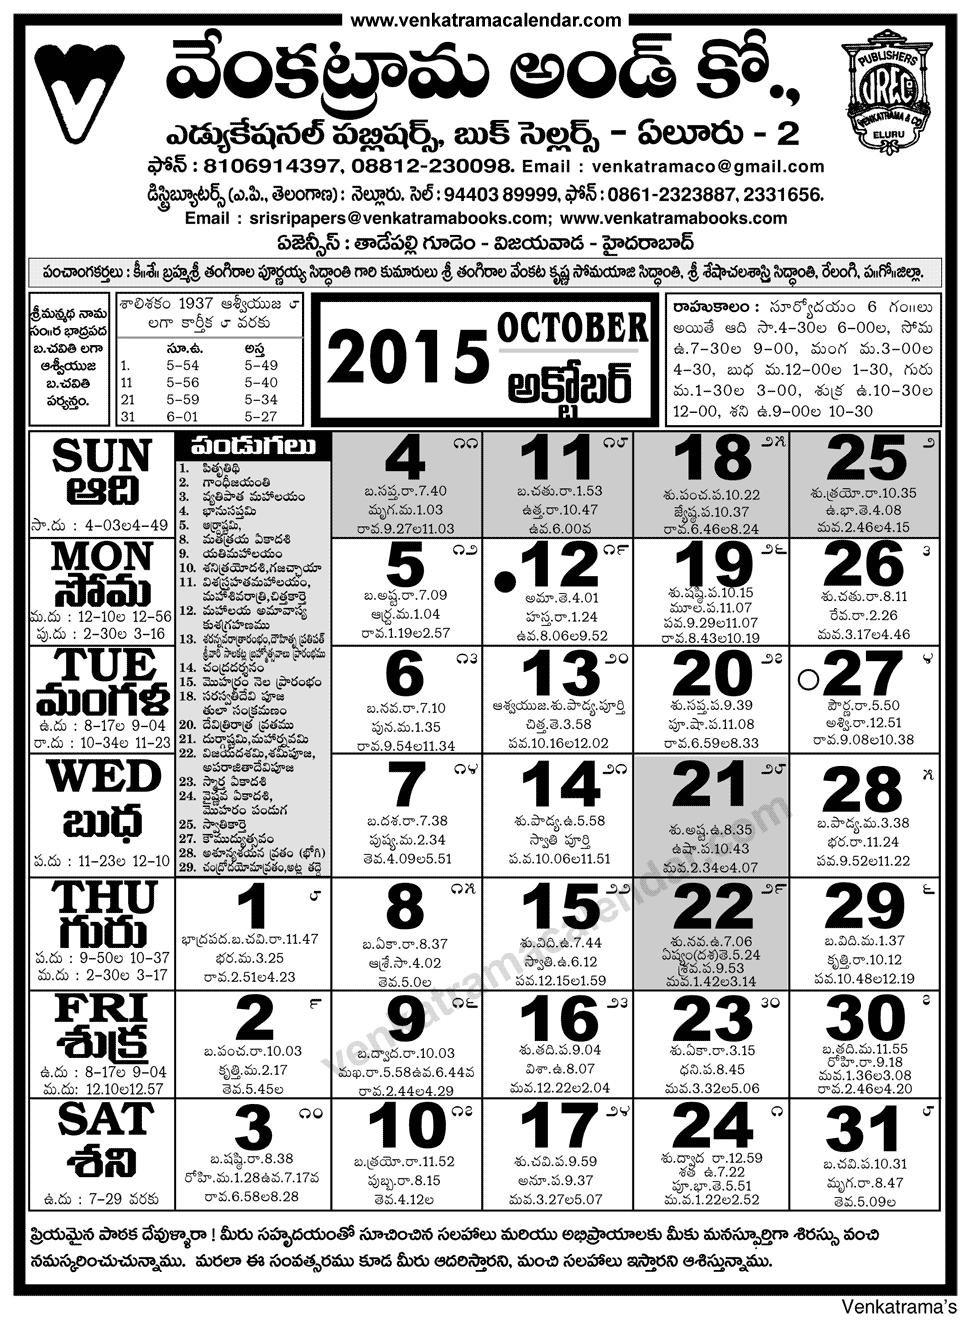 venkatrama and co telugu calendar 2015 pdf